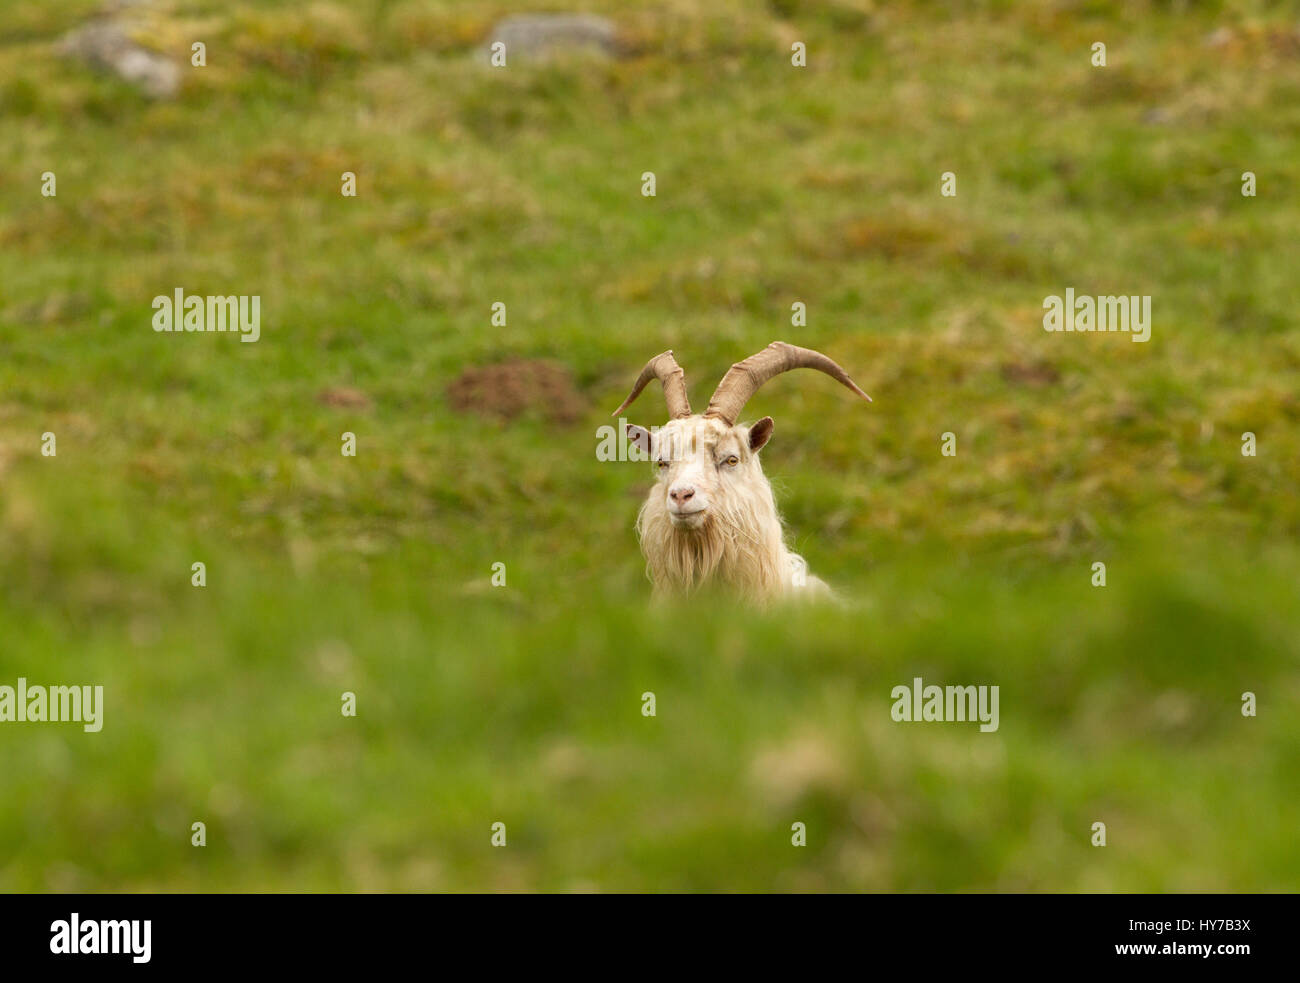 Feral Goat, single adult peering over grass mound.  Taken June. Findhorn Valley, Nr Tomatin, Scotland, UK. - Stock Image